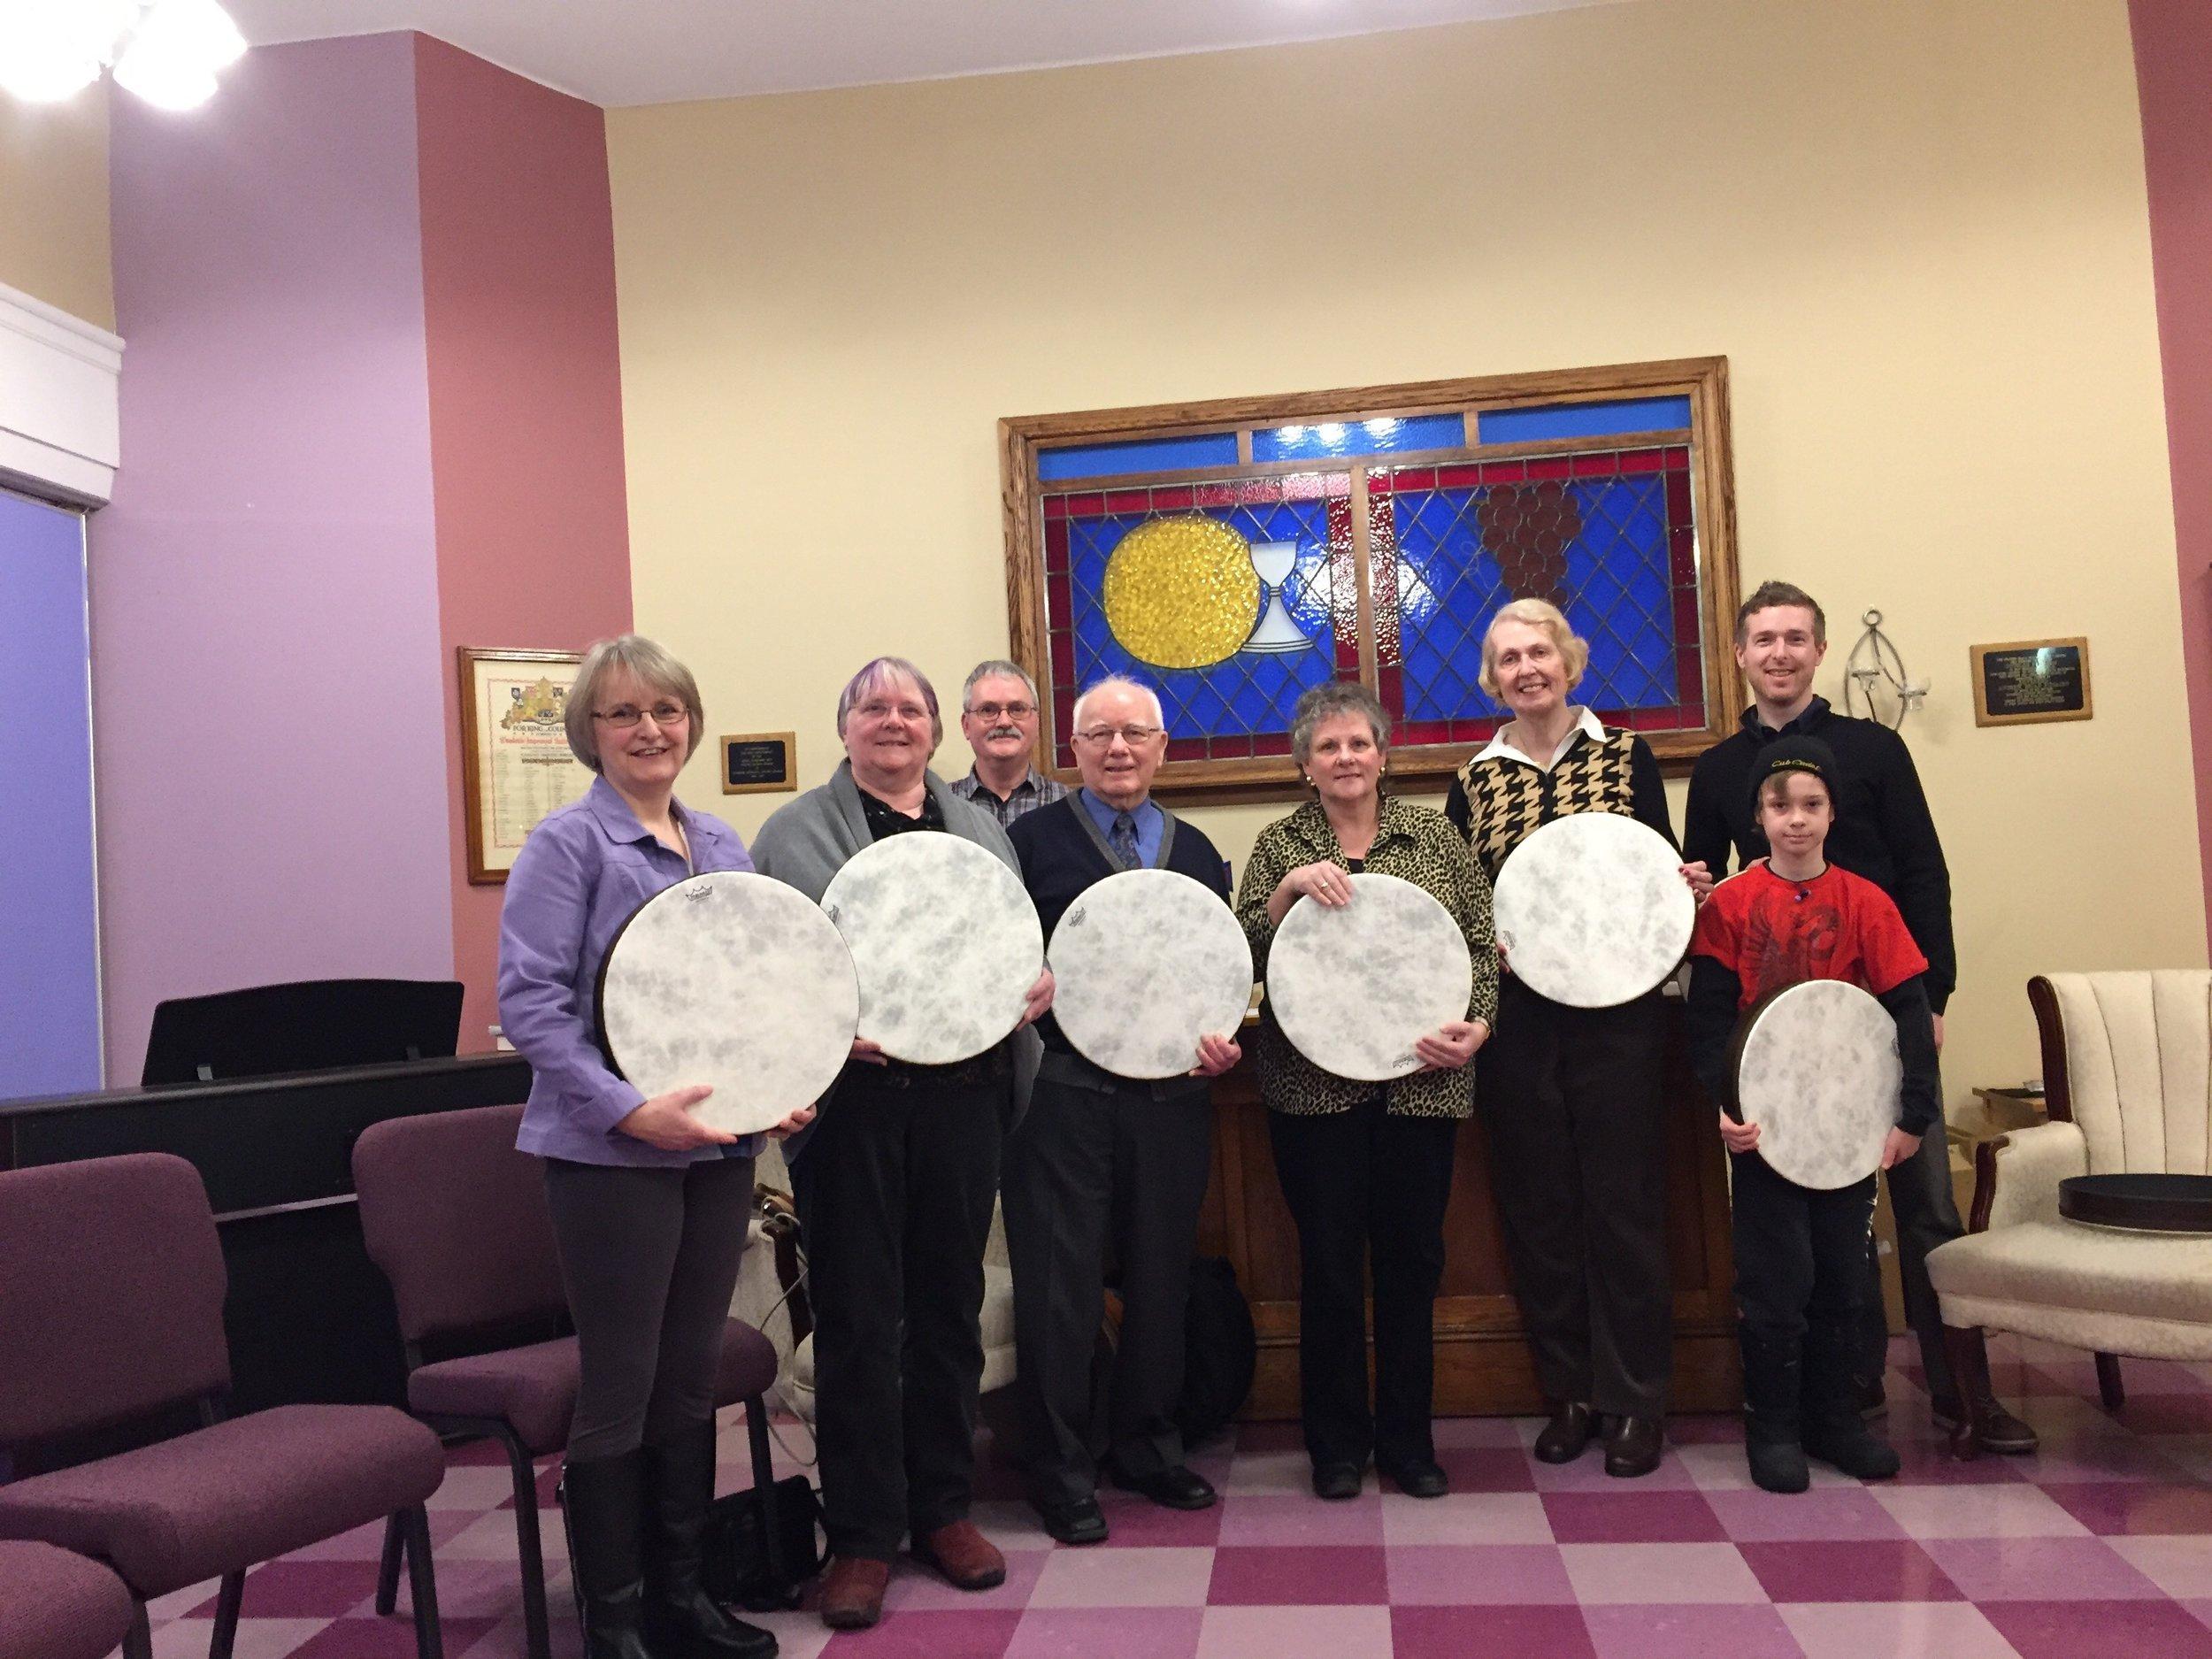 Cole Harbour - Woodside Biblical Drummers!